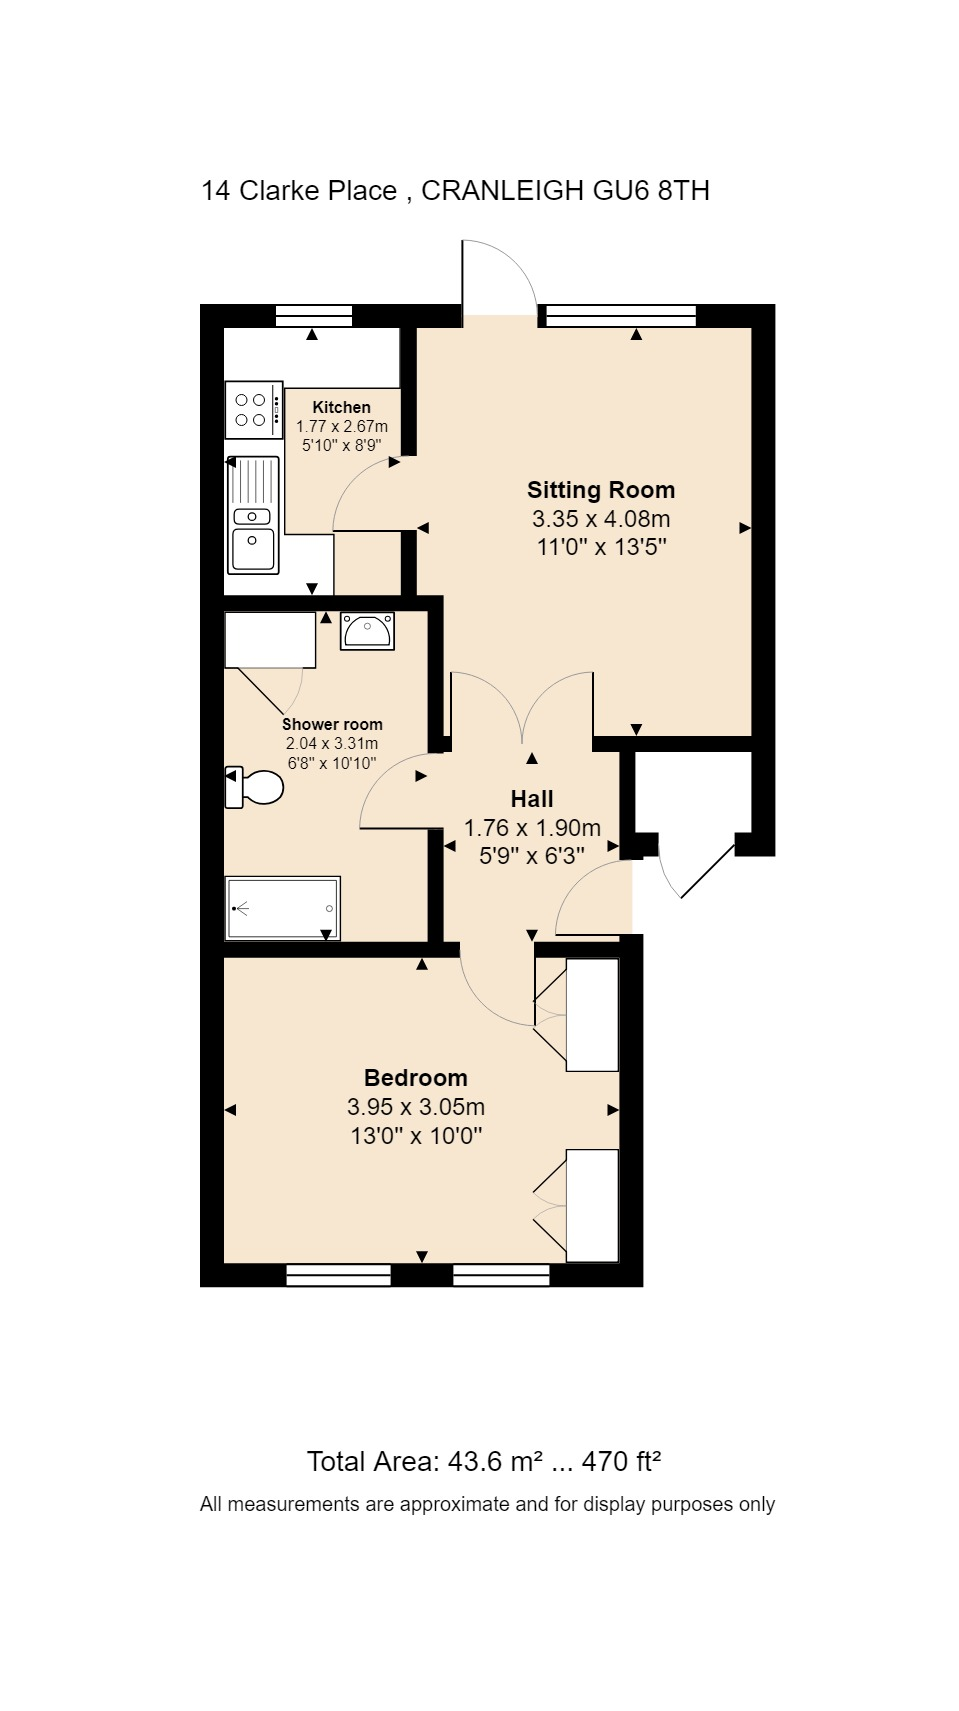 14 Clarke Place Floorplan